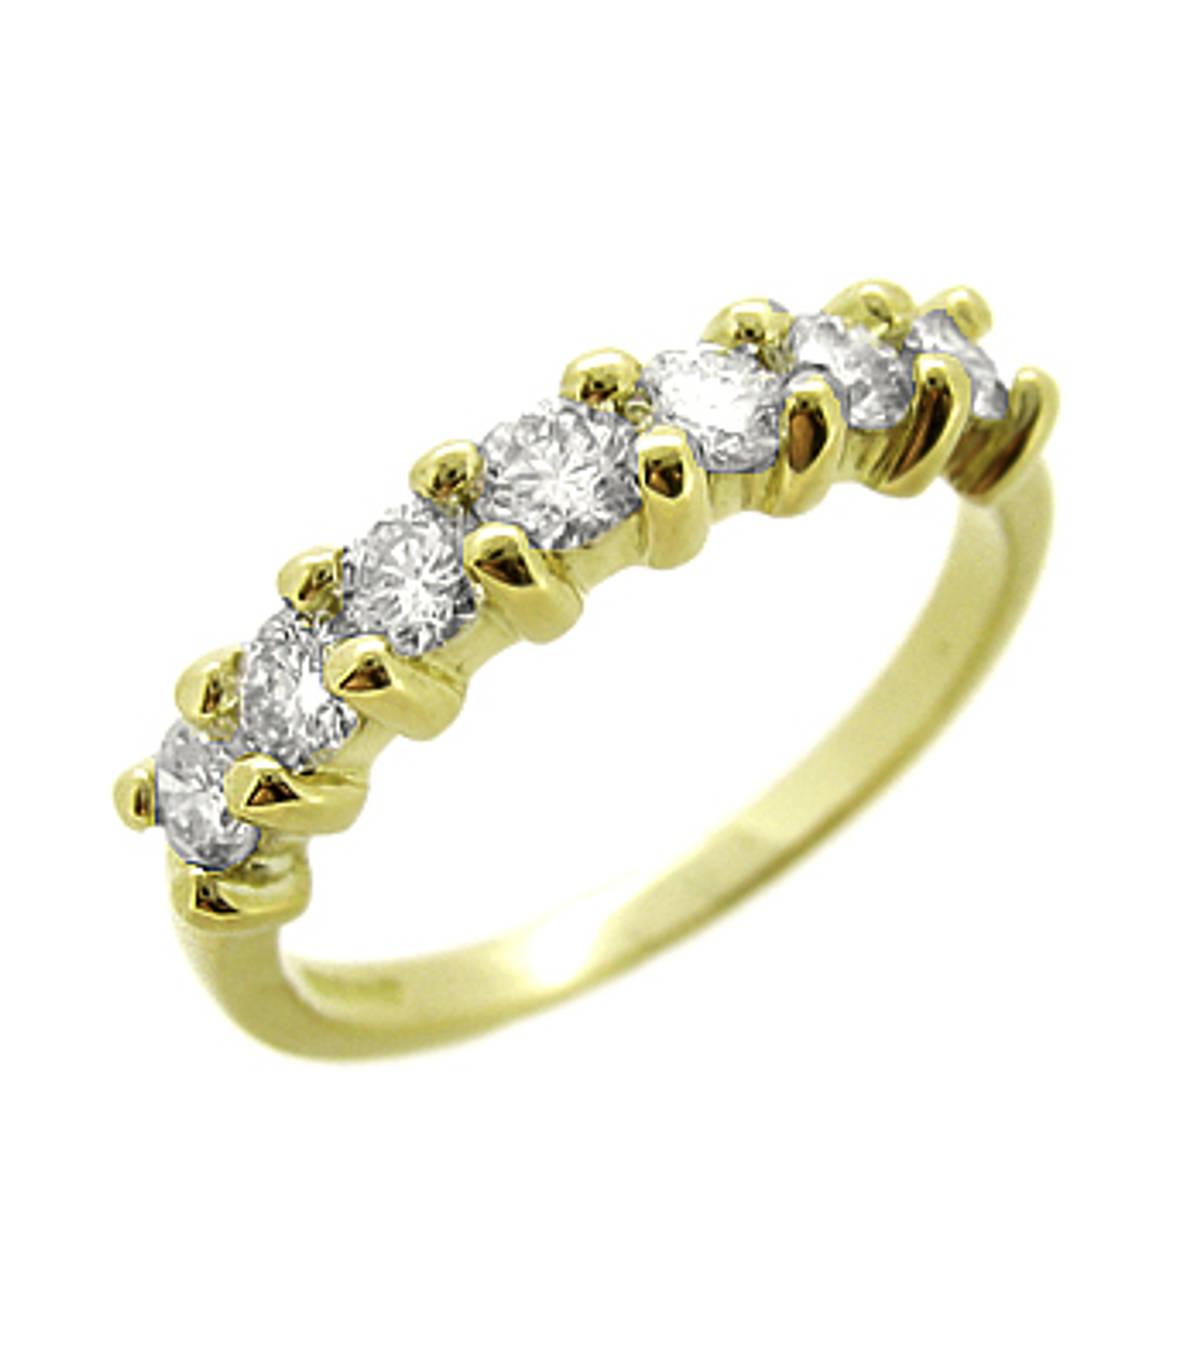 18k yellow gold brilliant cut 7st diamond claw set eternity ring Carat: total diamond weight 0.74cts  Metal: 18k yellow gold